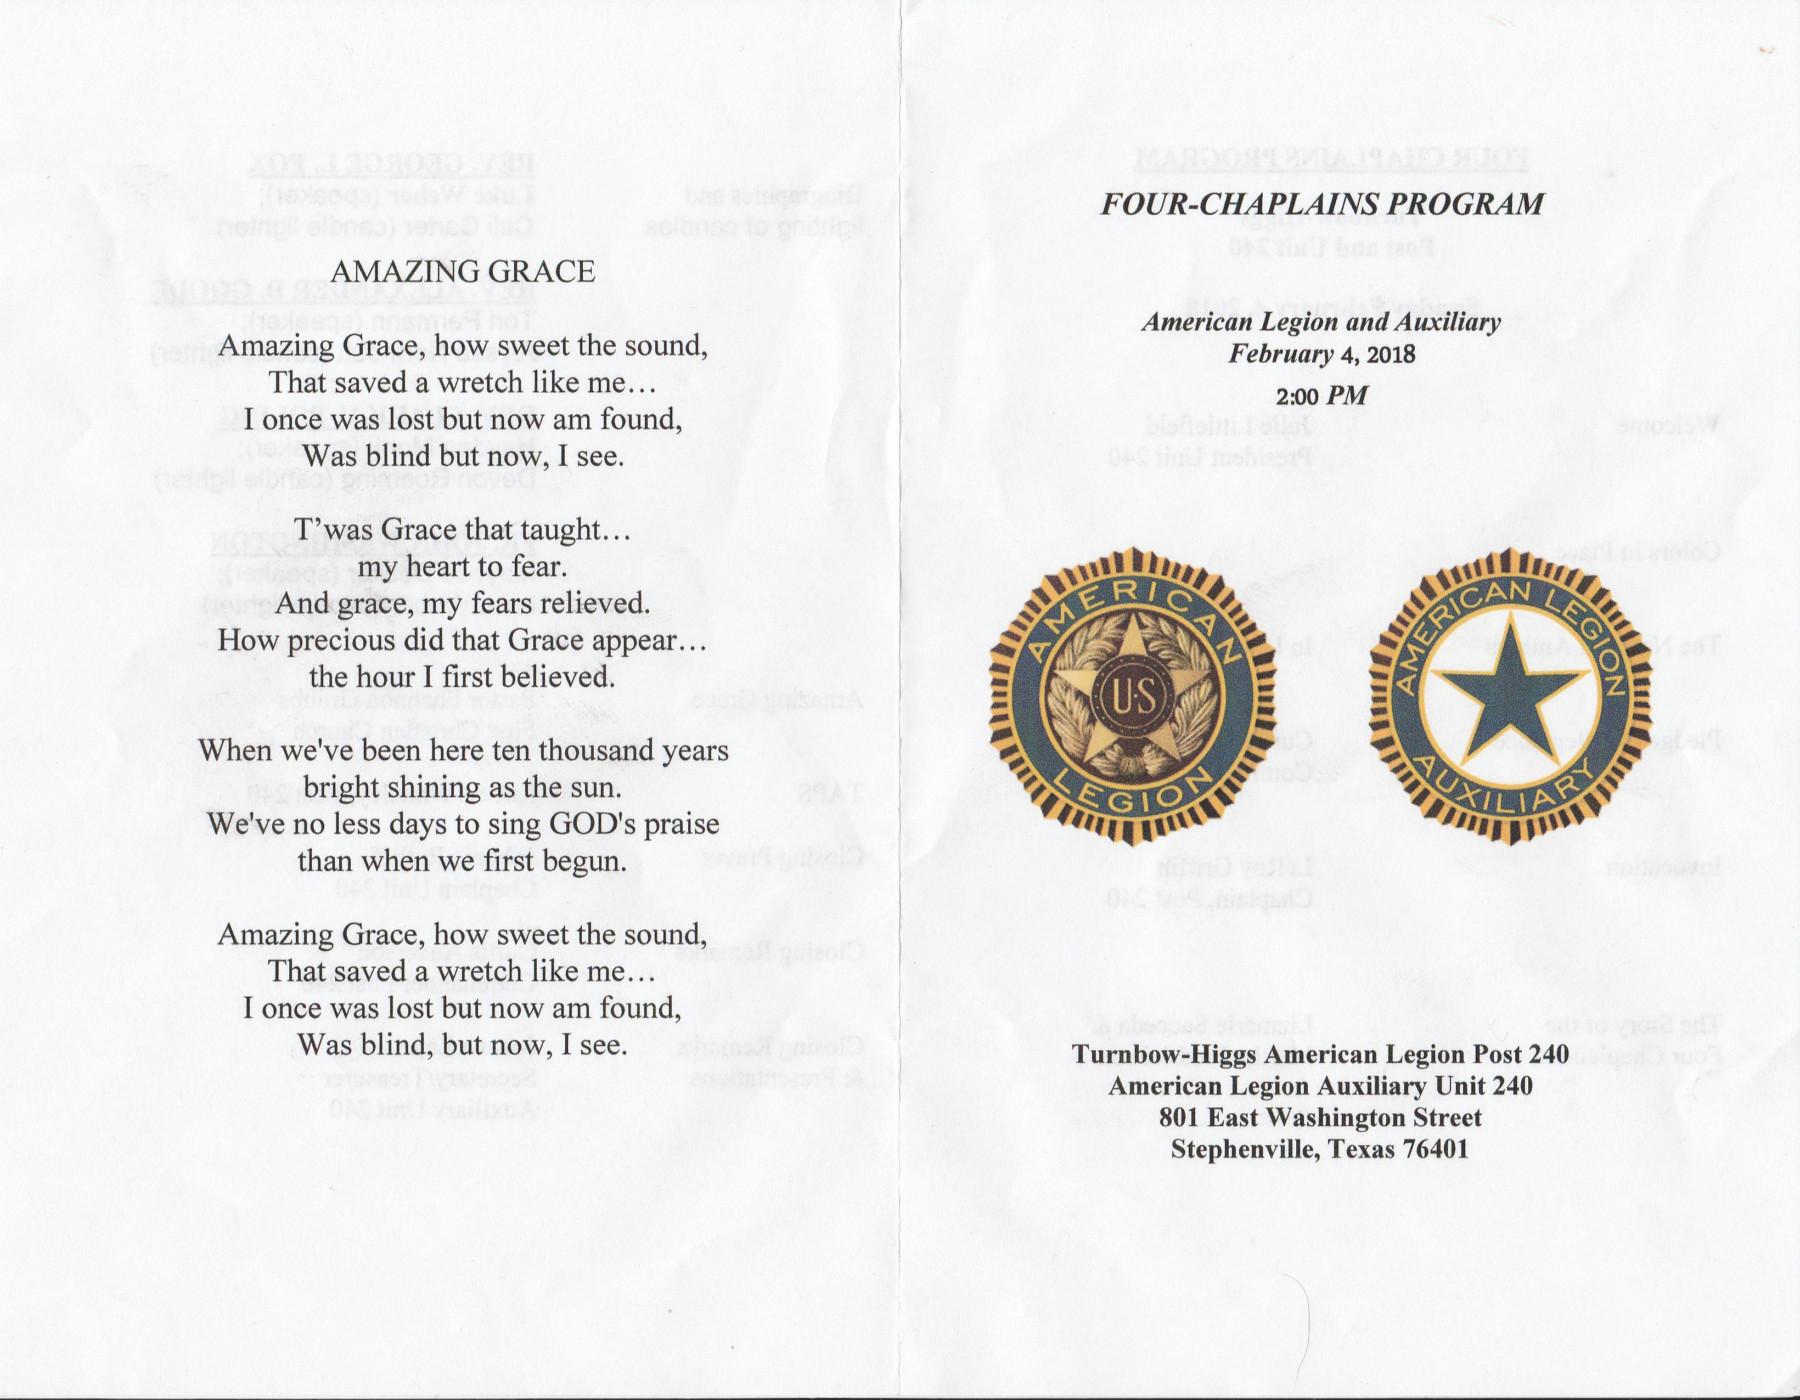 Four Chaplains Program 1 Program cover